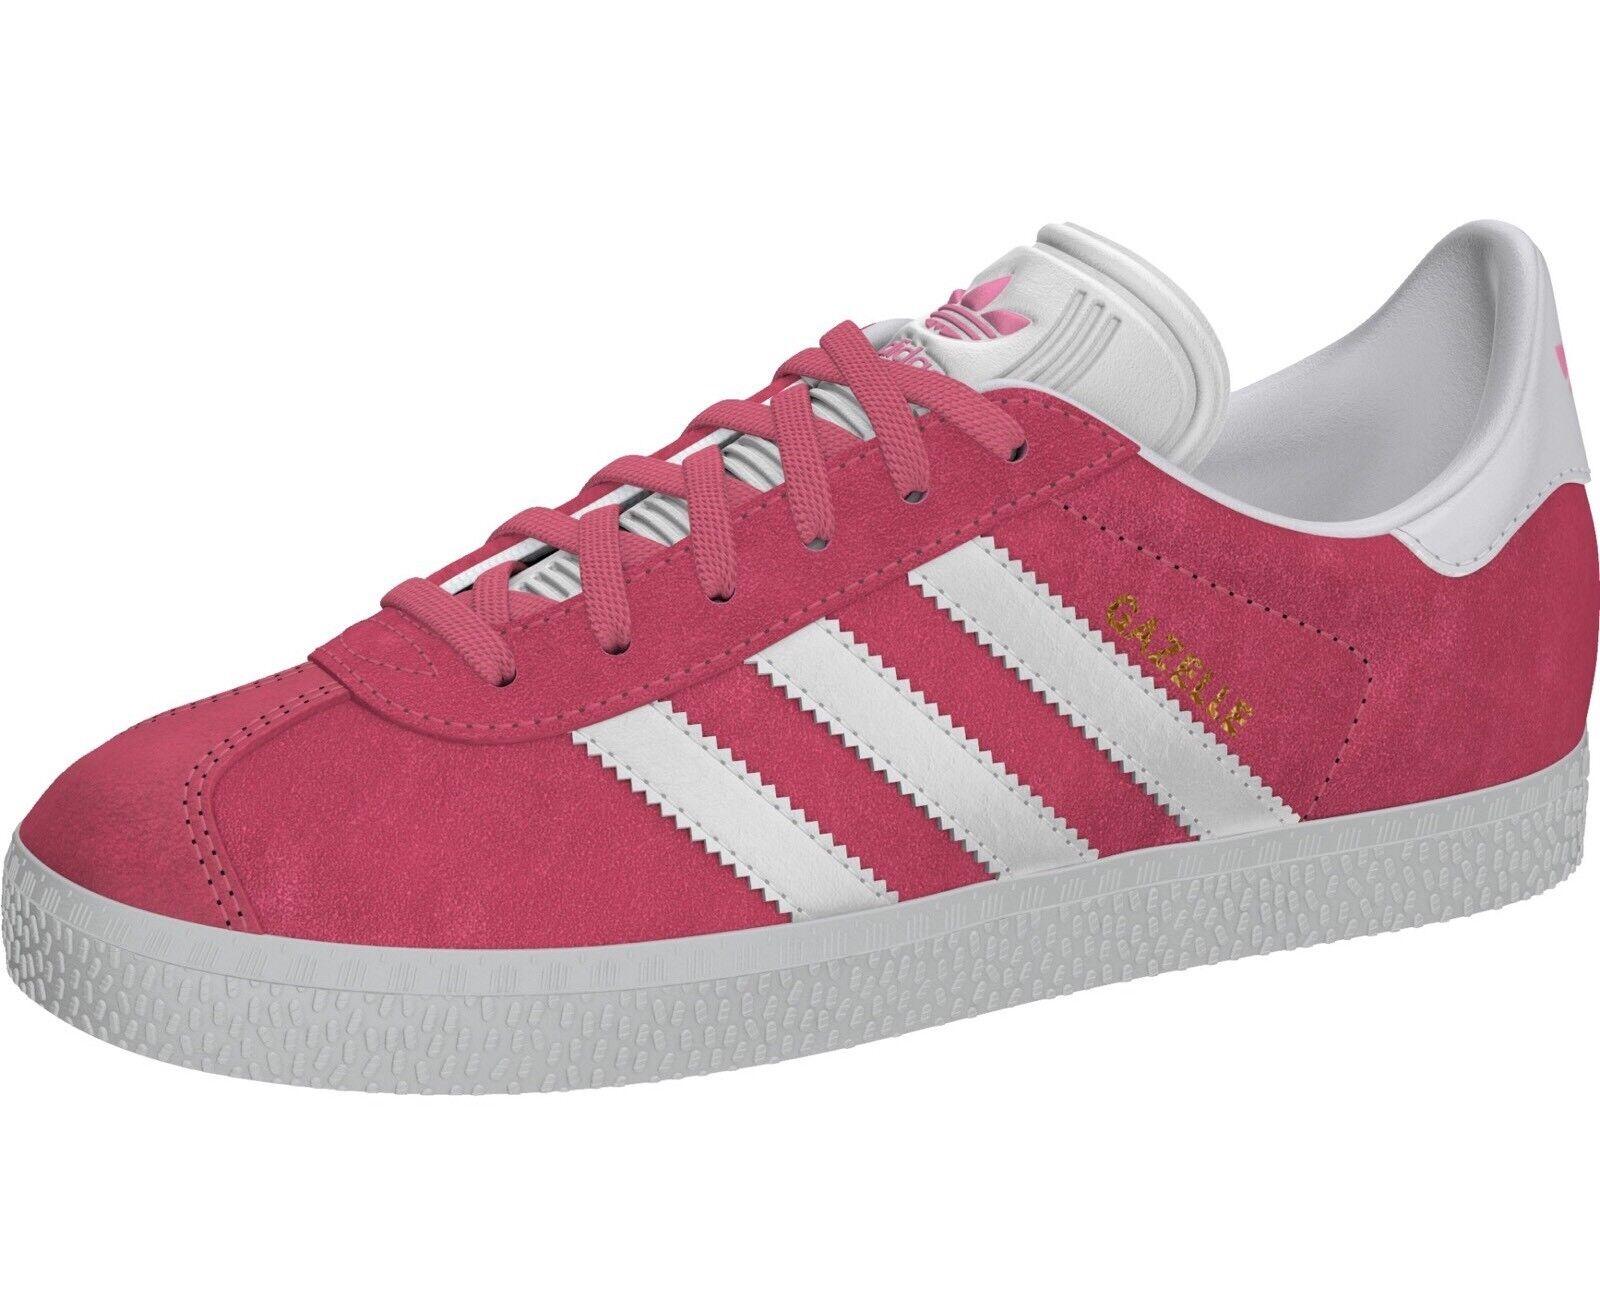 Adidas Gazelle J Trainers Größe UK 5.5 (EUR 38 38 38 2/3) Brand New With Box 2e74a4